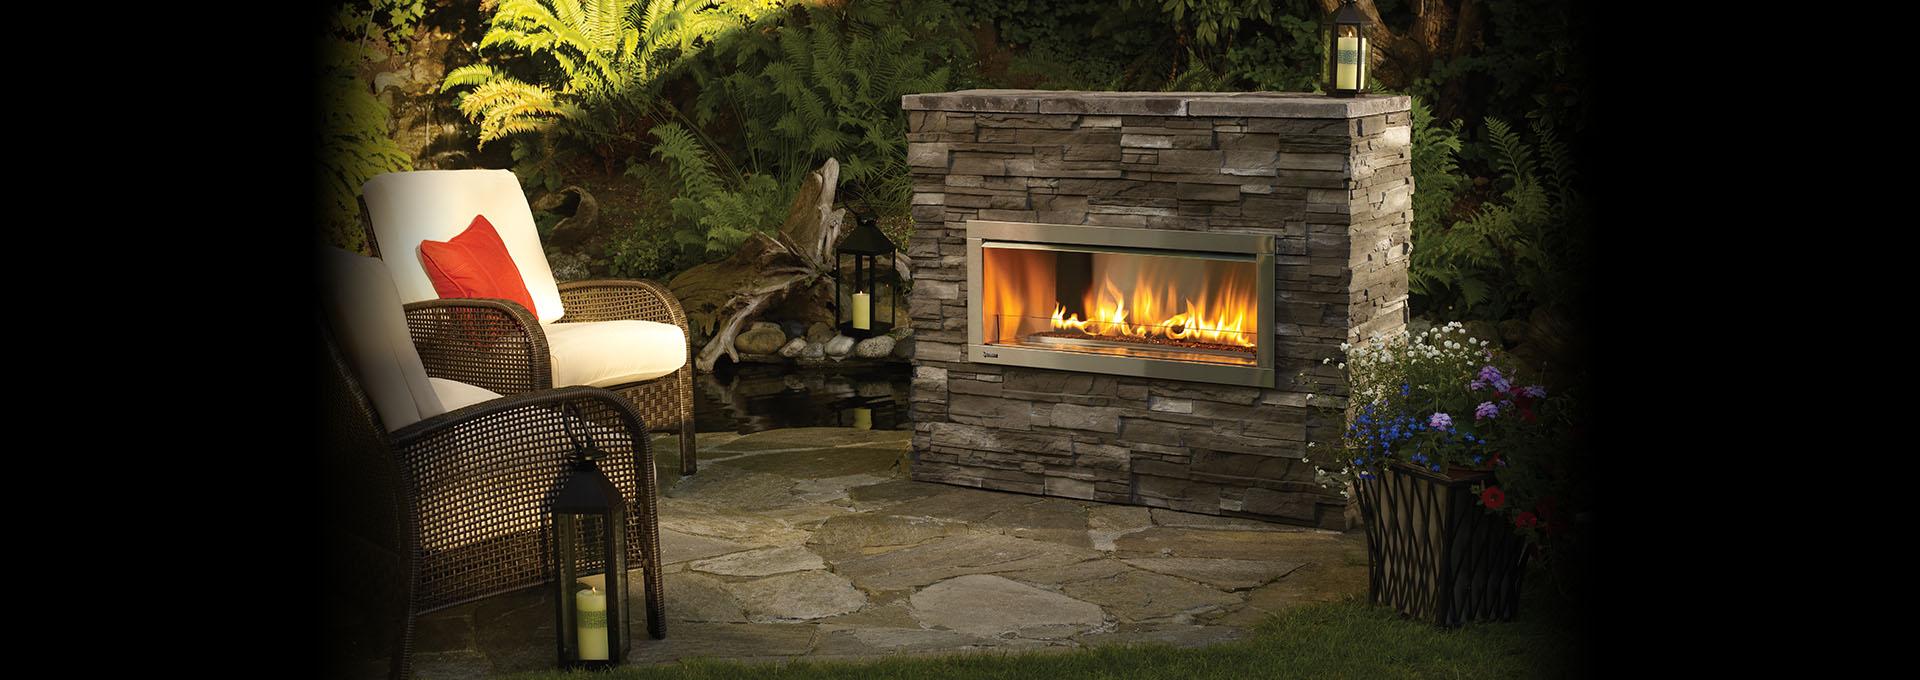 Modern Outdoor Gas Fireplaces Fireplace Kits Regency